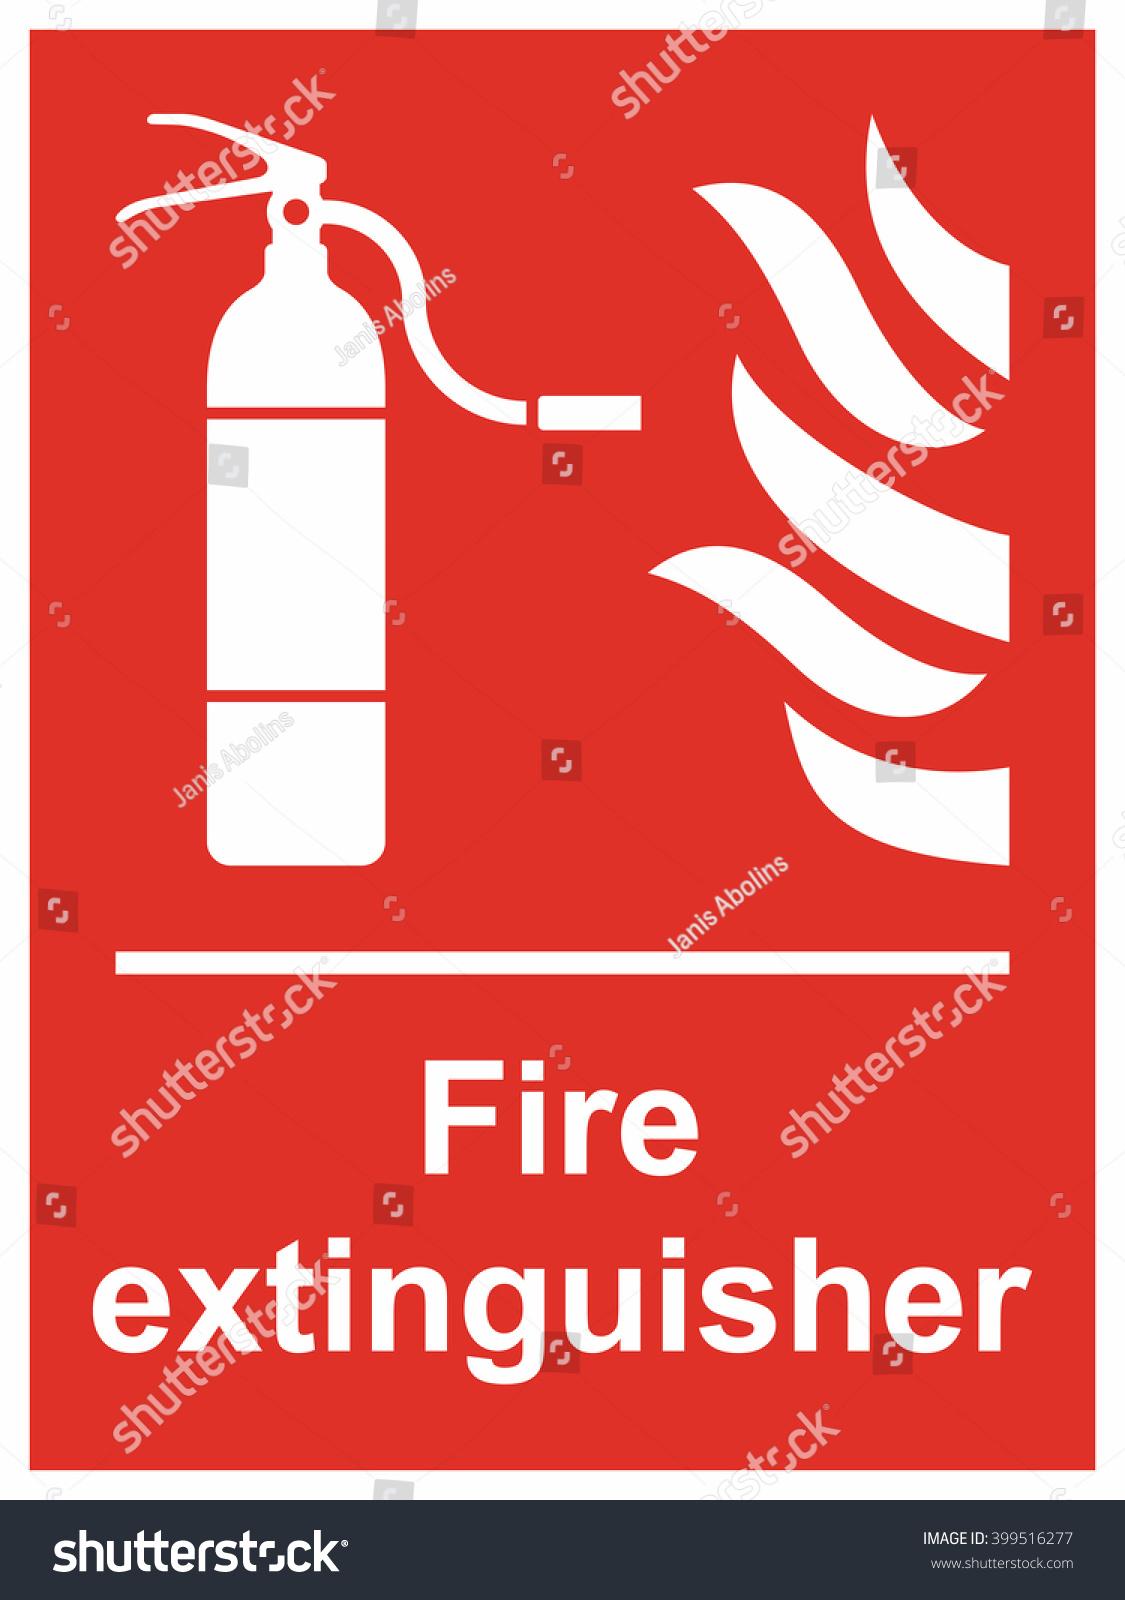 fire extinguisher sign stock vector illustration 399516277